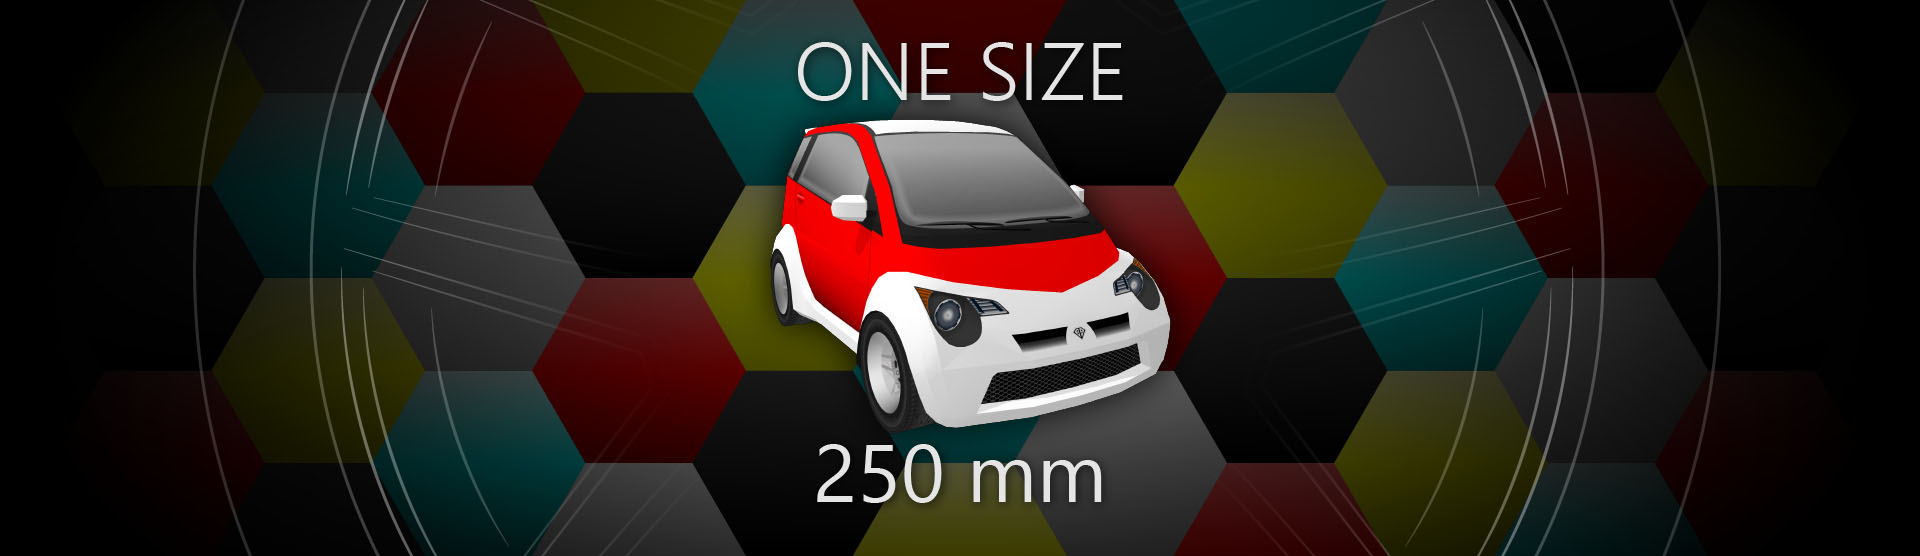 Panto Download Size